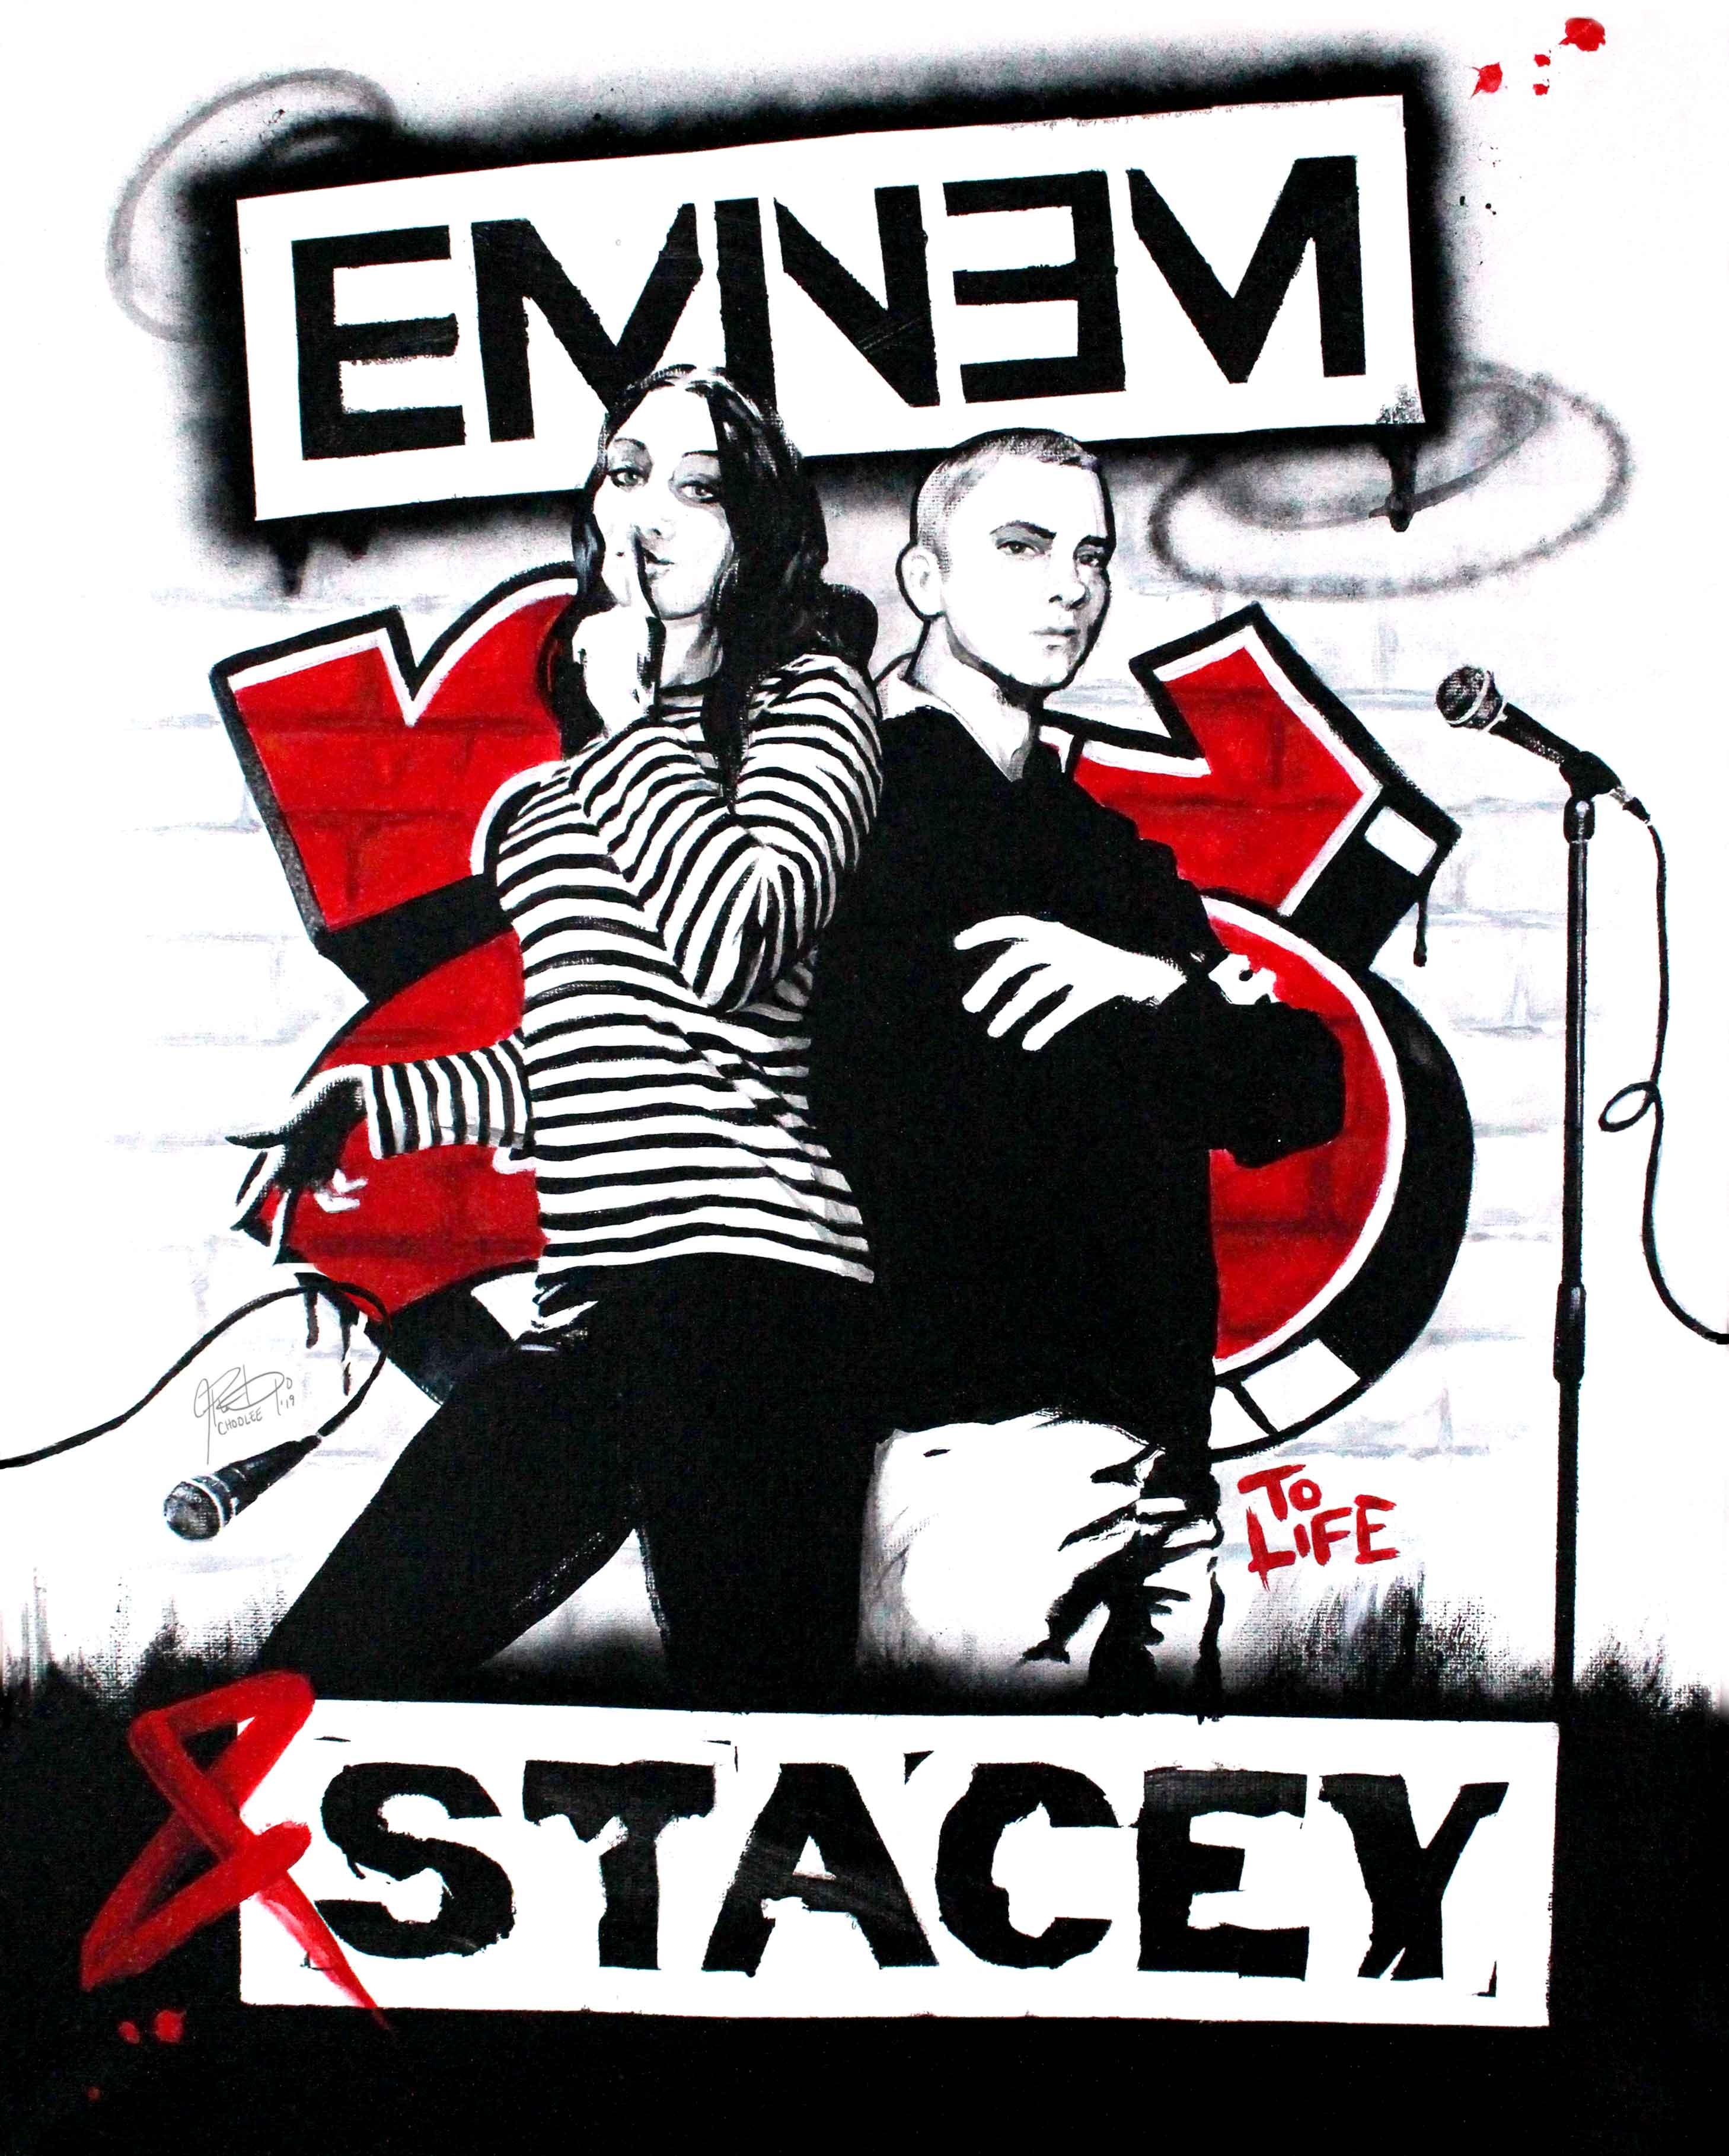 Celebrity Graffiti Portrait